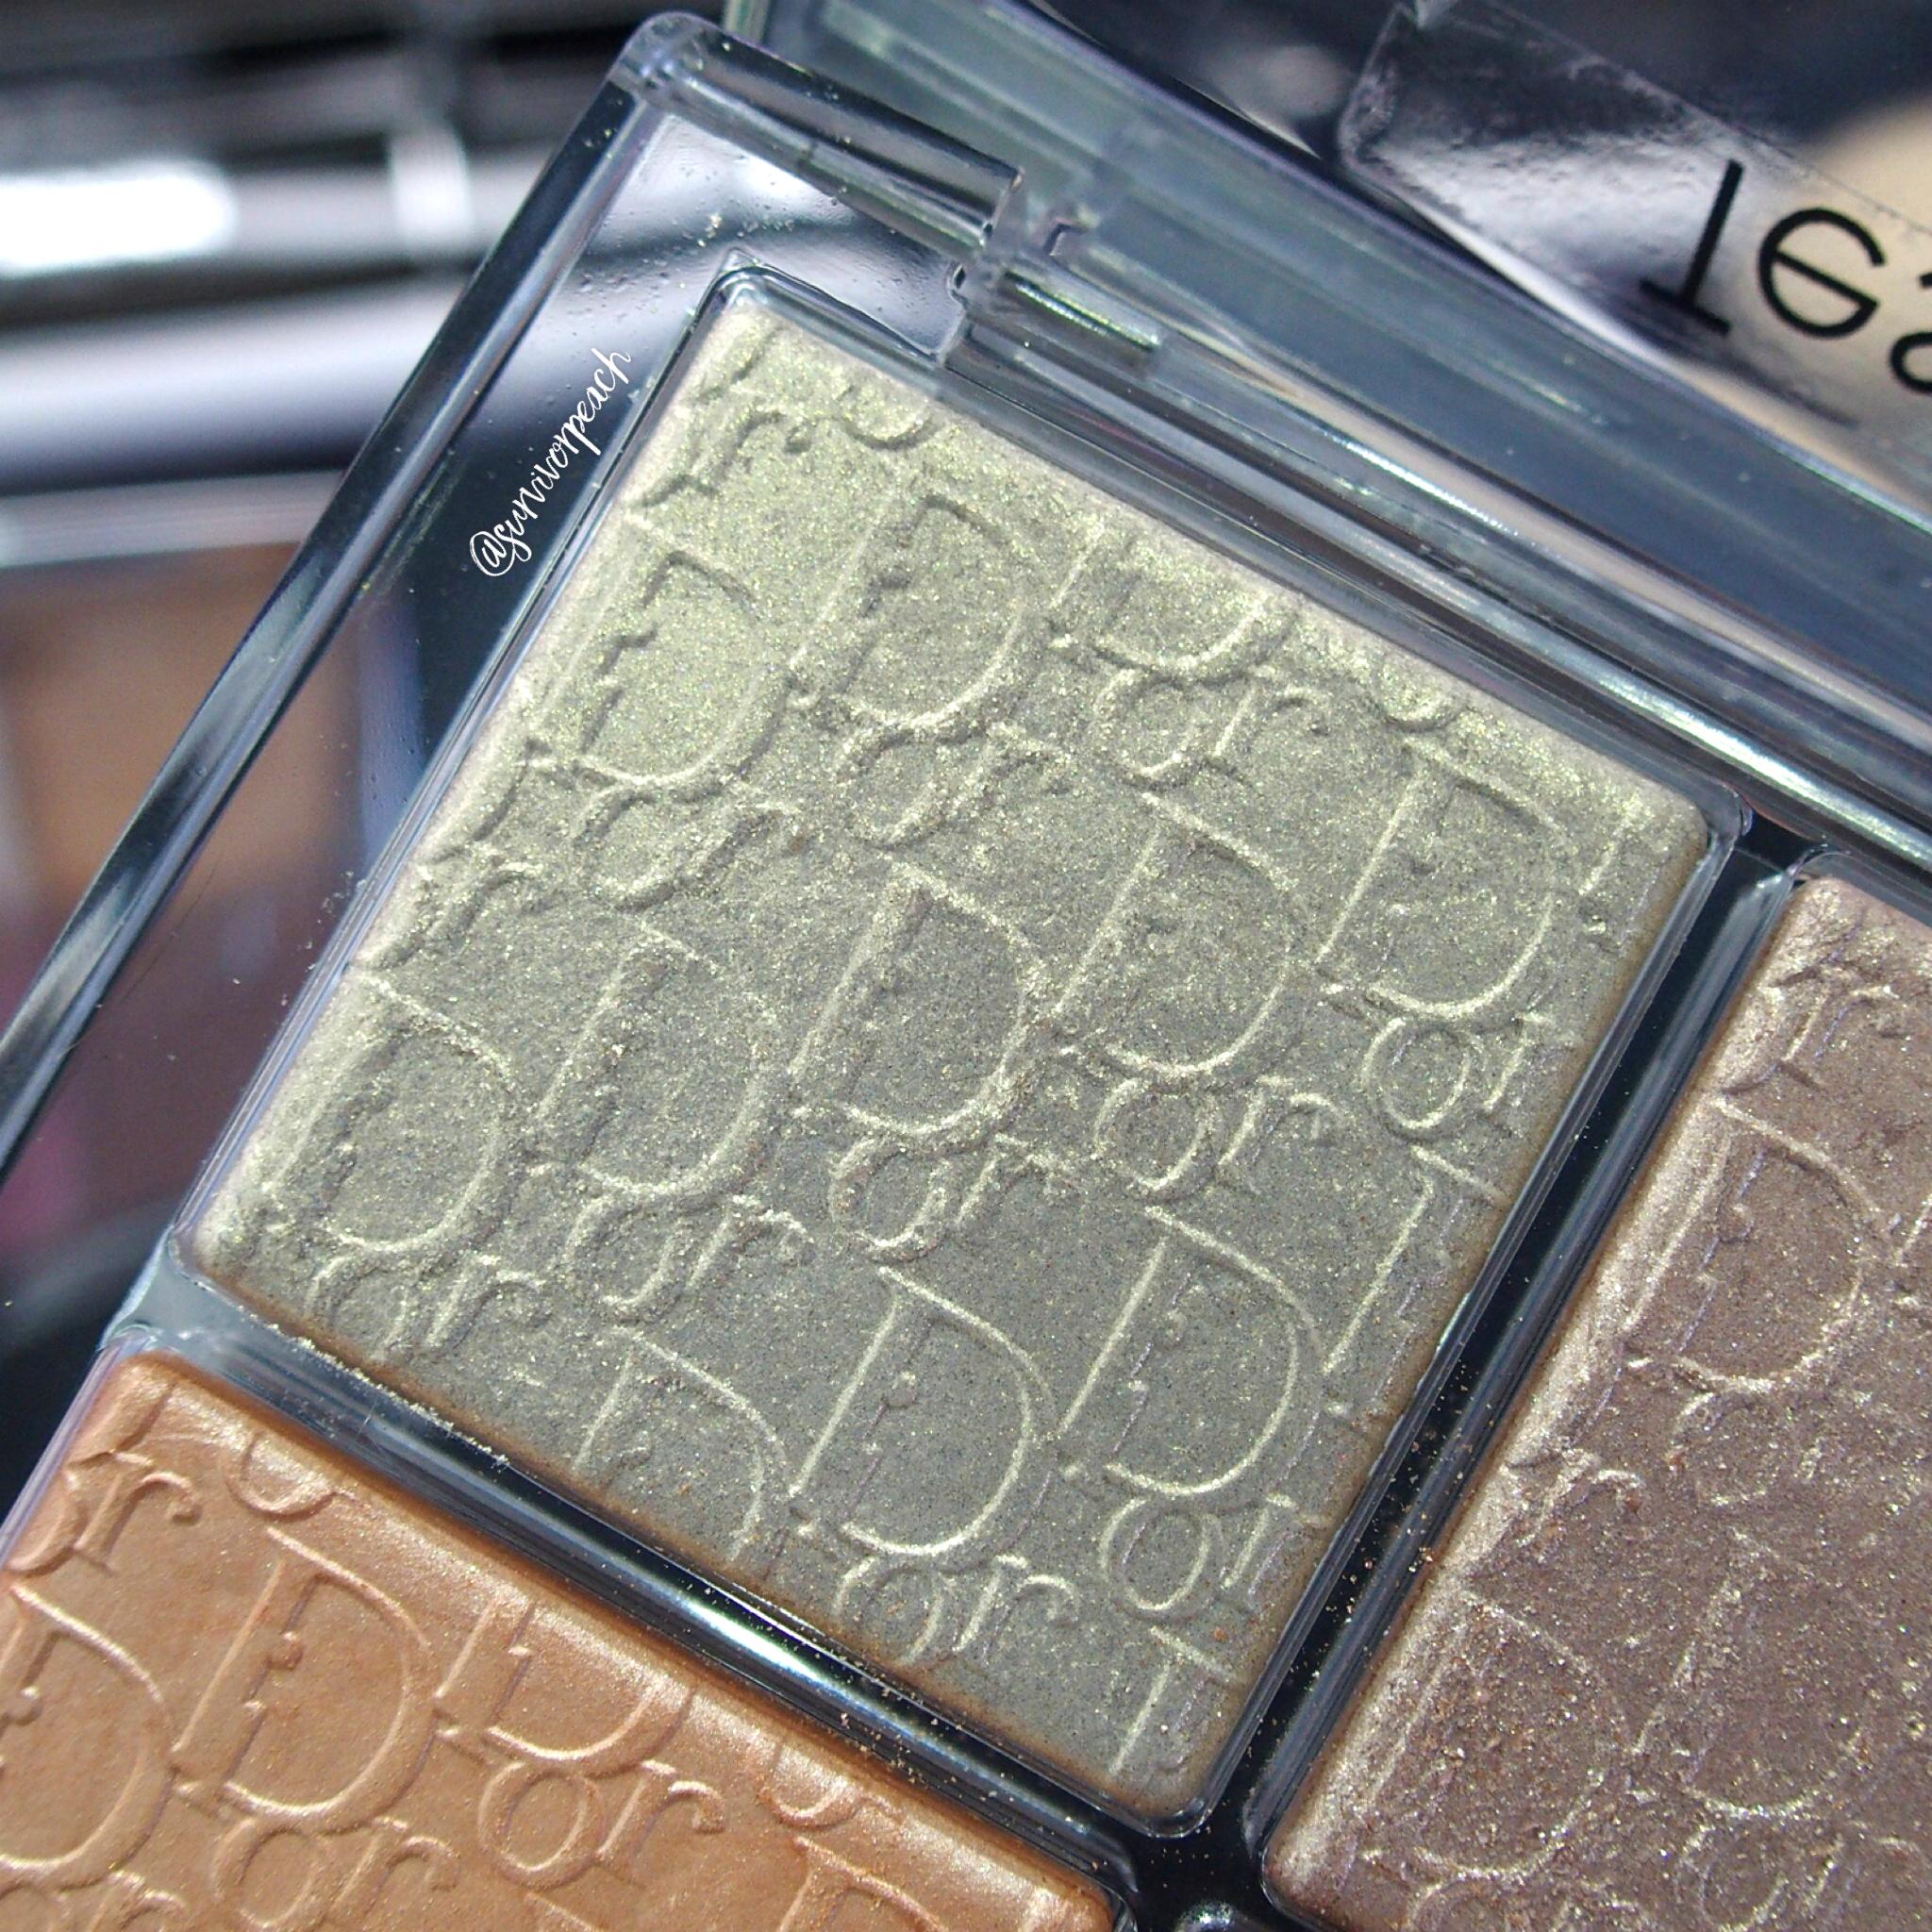 Dior Backstage Glow Face Palette 002 Glitz